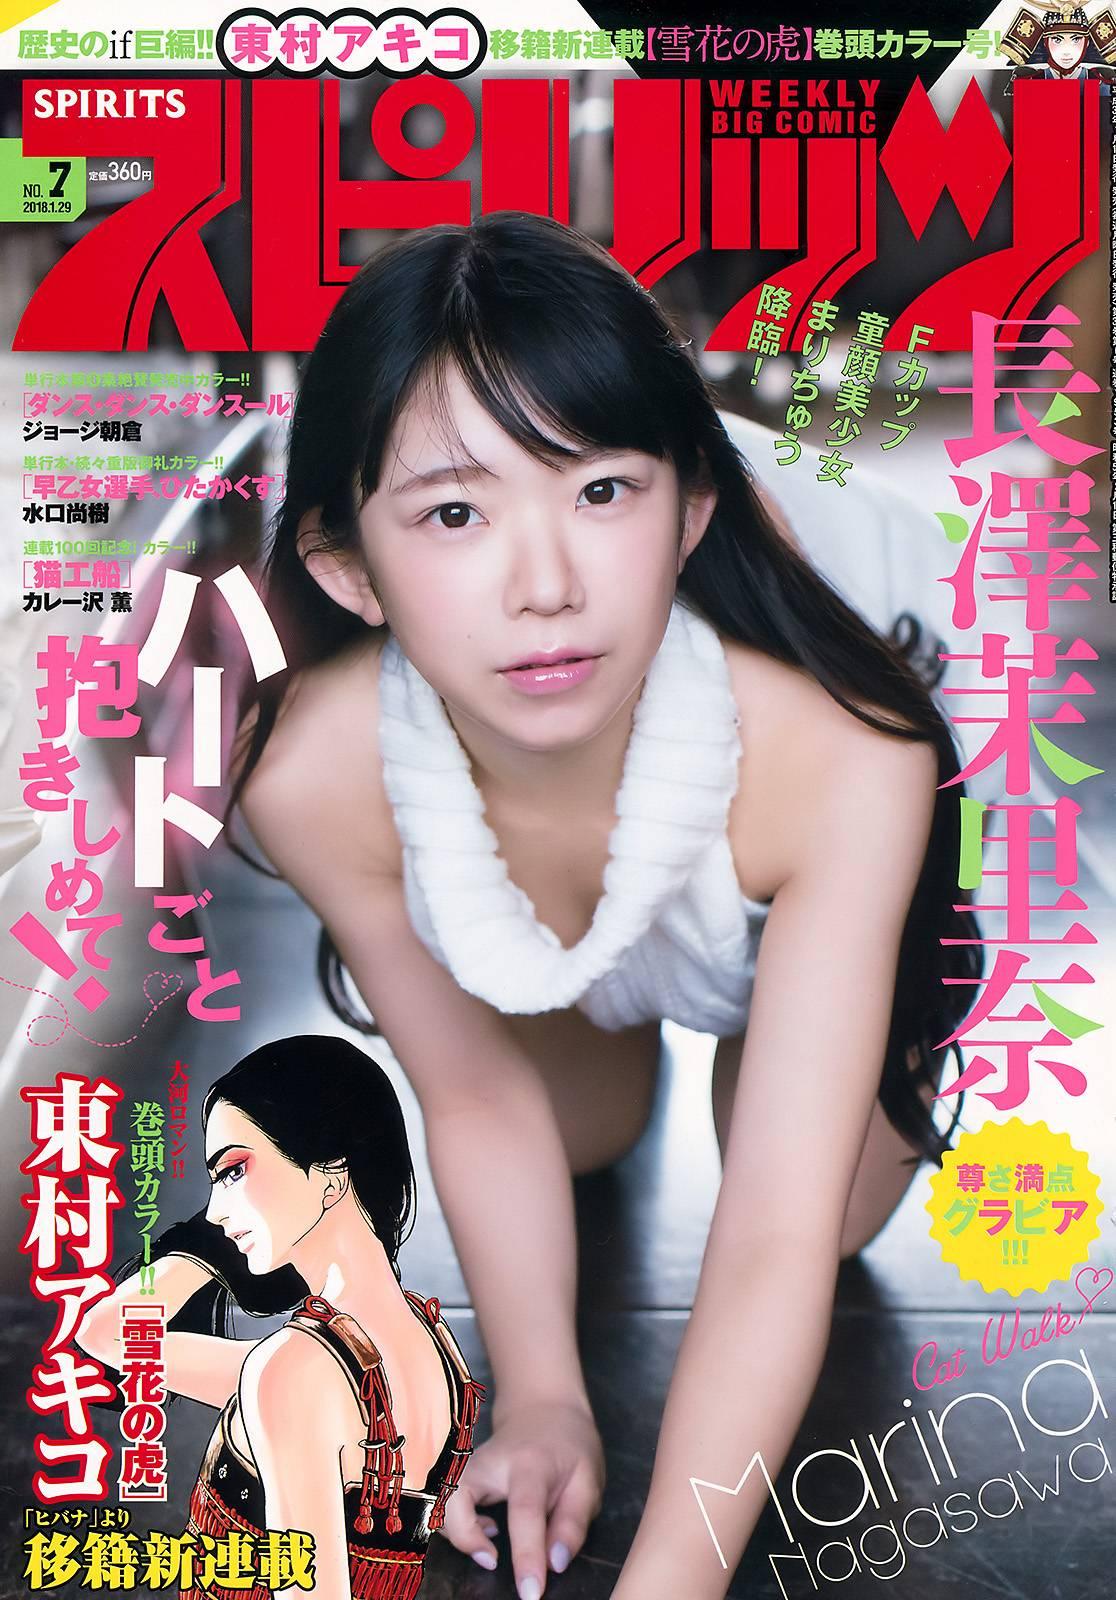 Big Comic Spirits, Magazine, Nagasawa Marina (長澤茉里奈), Oppai